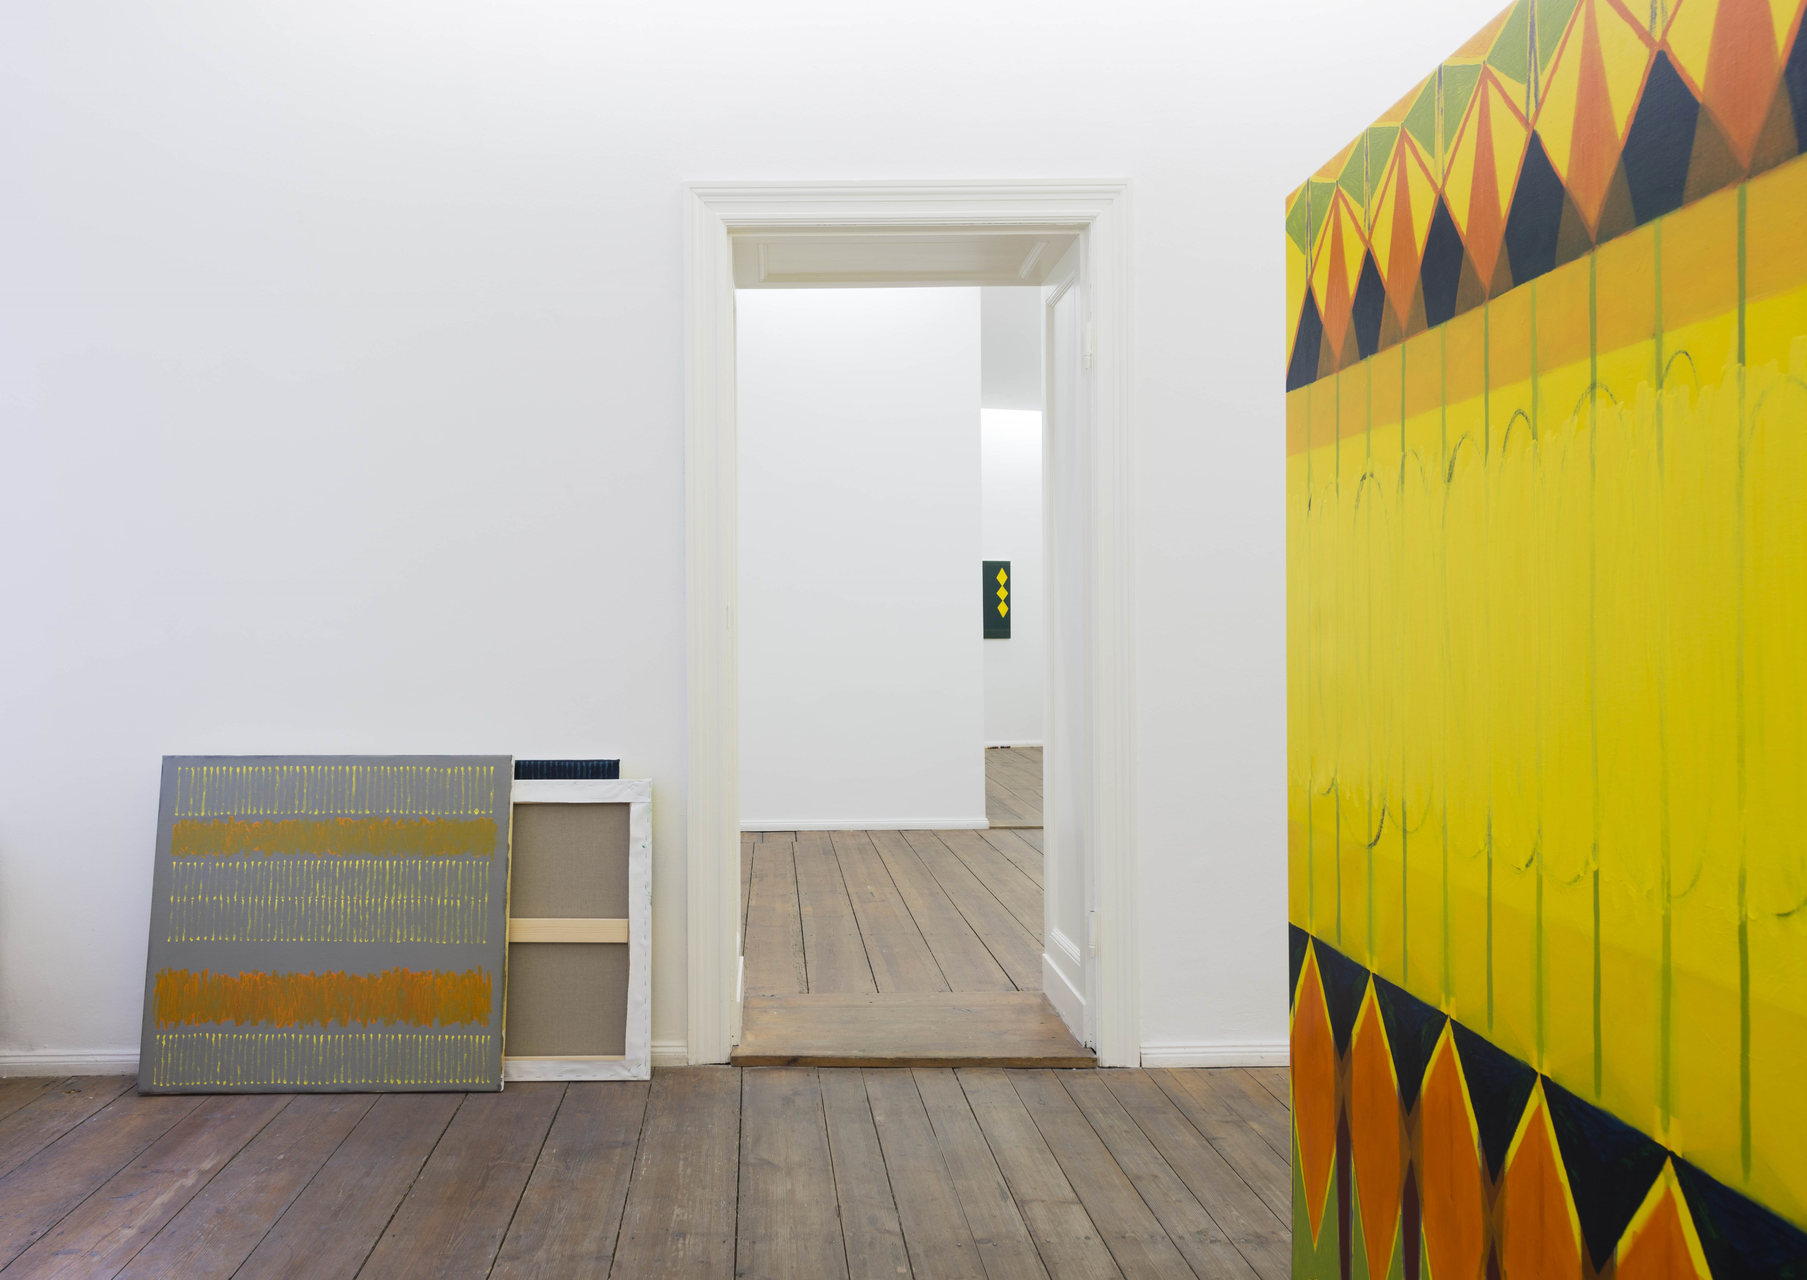 TGood TSJO¦êRBERG artdoc Grimmuseum 27 02 2015 _0113